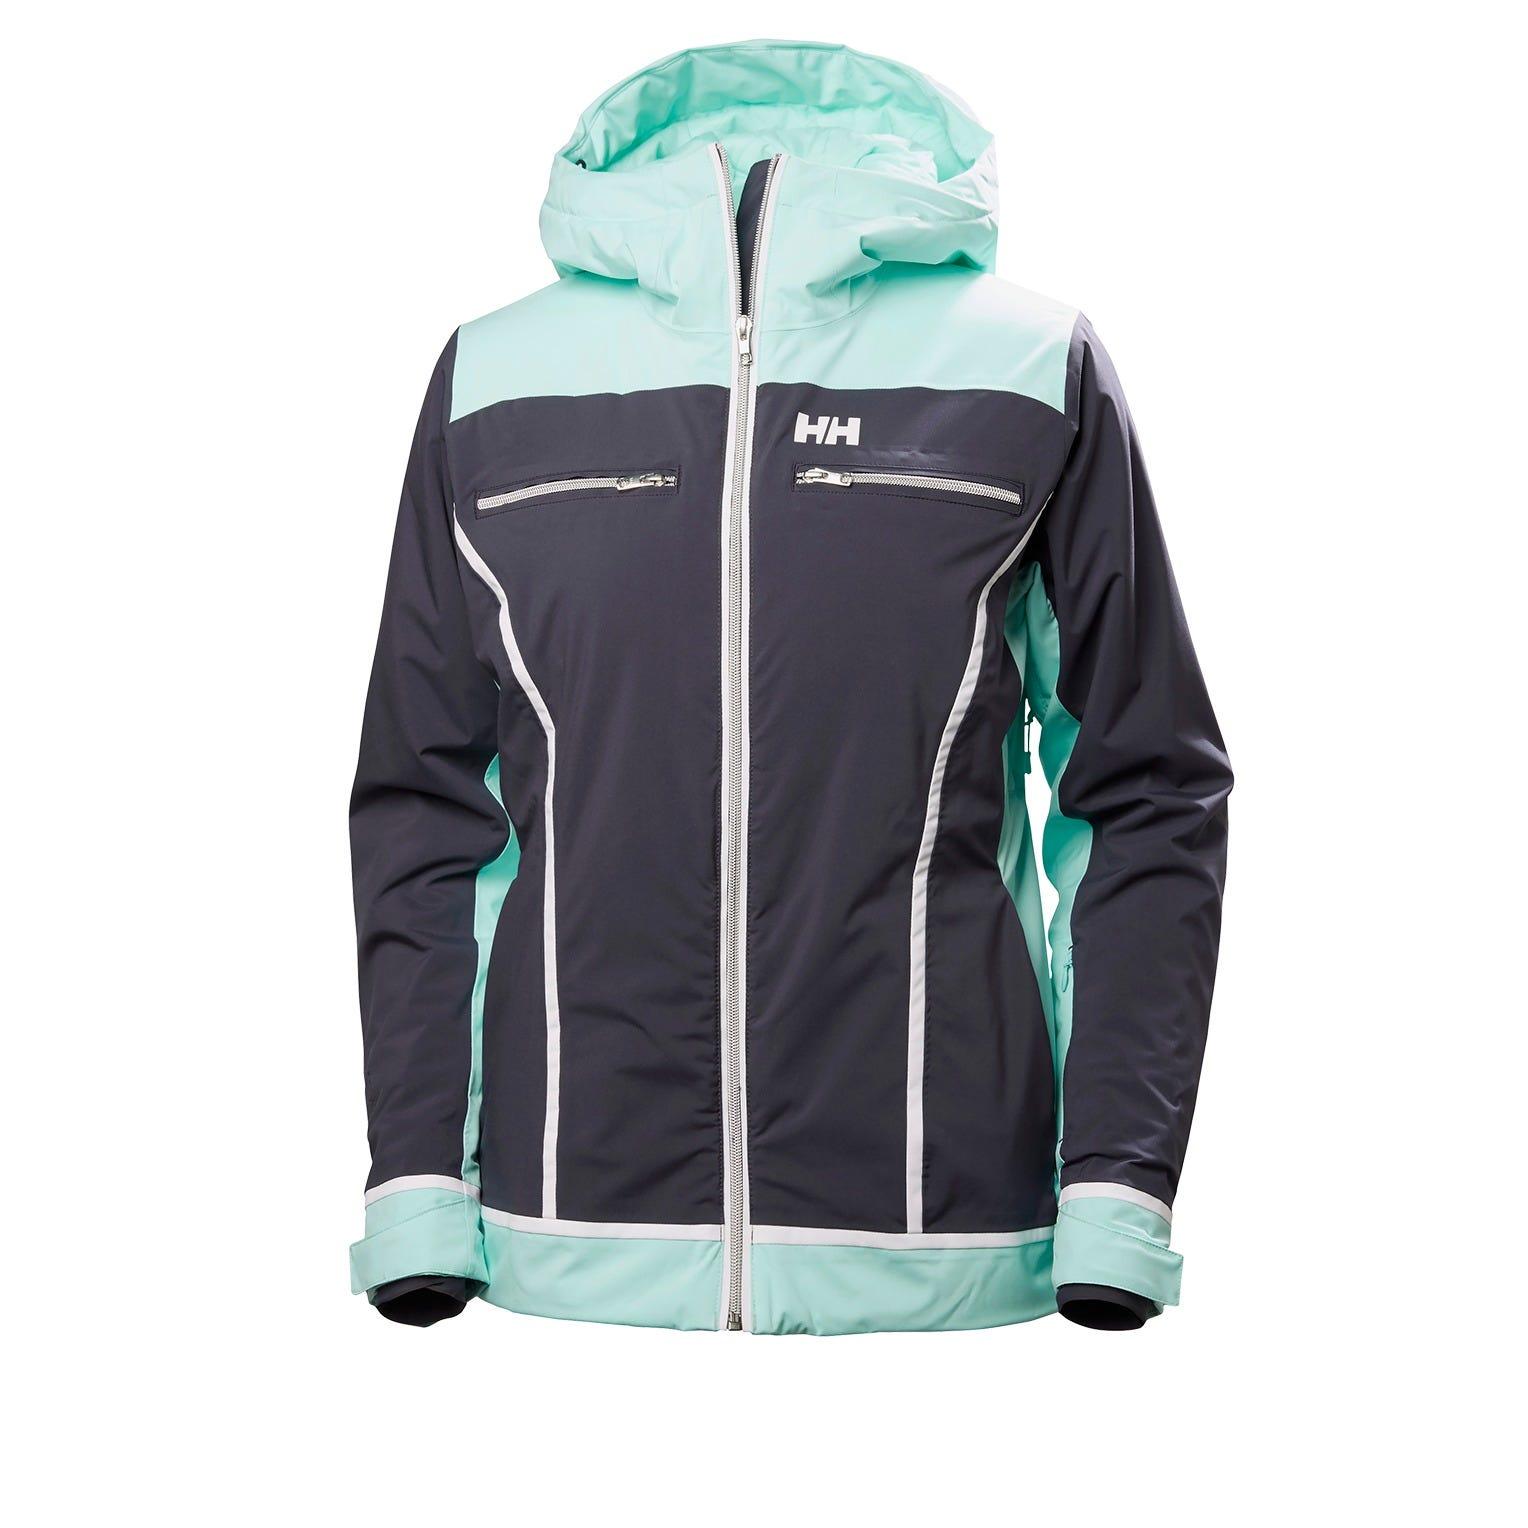 ac4c74c1cc36 Womens Belle Insulated Glow Zippers Ski Jacket